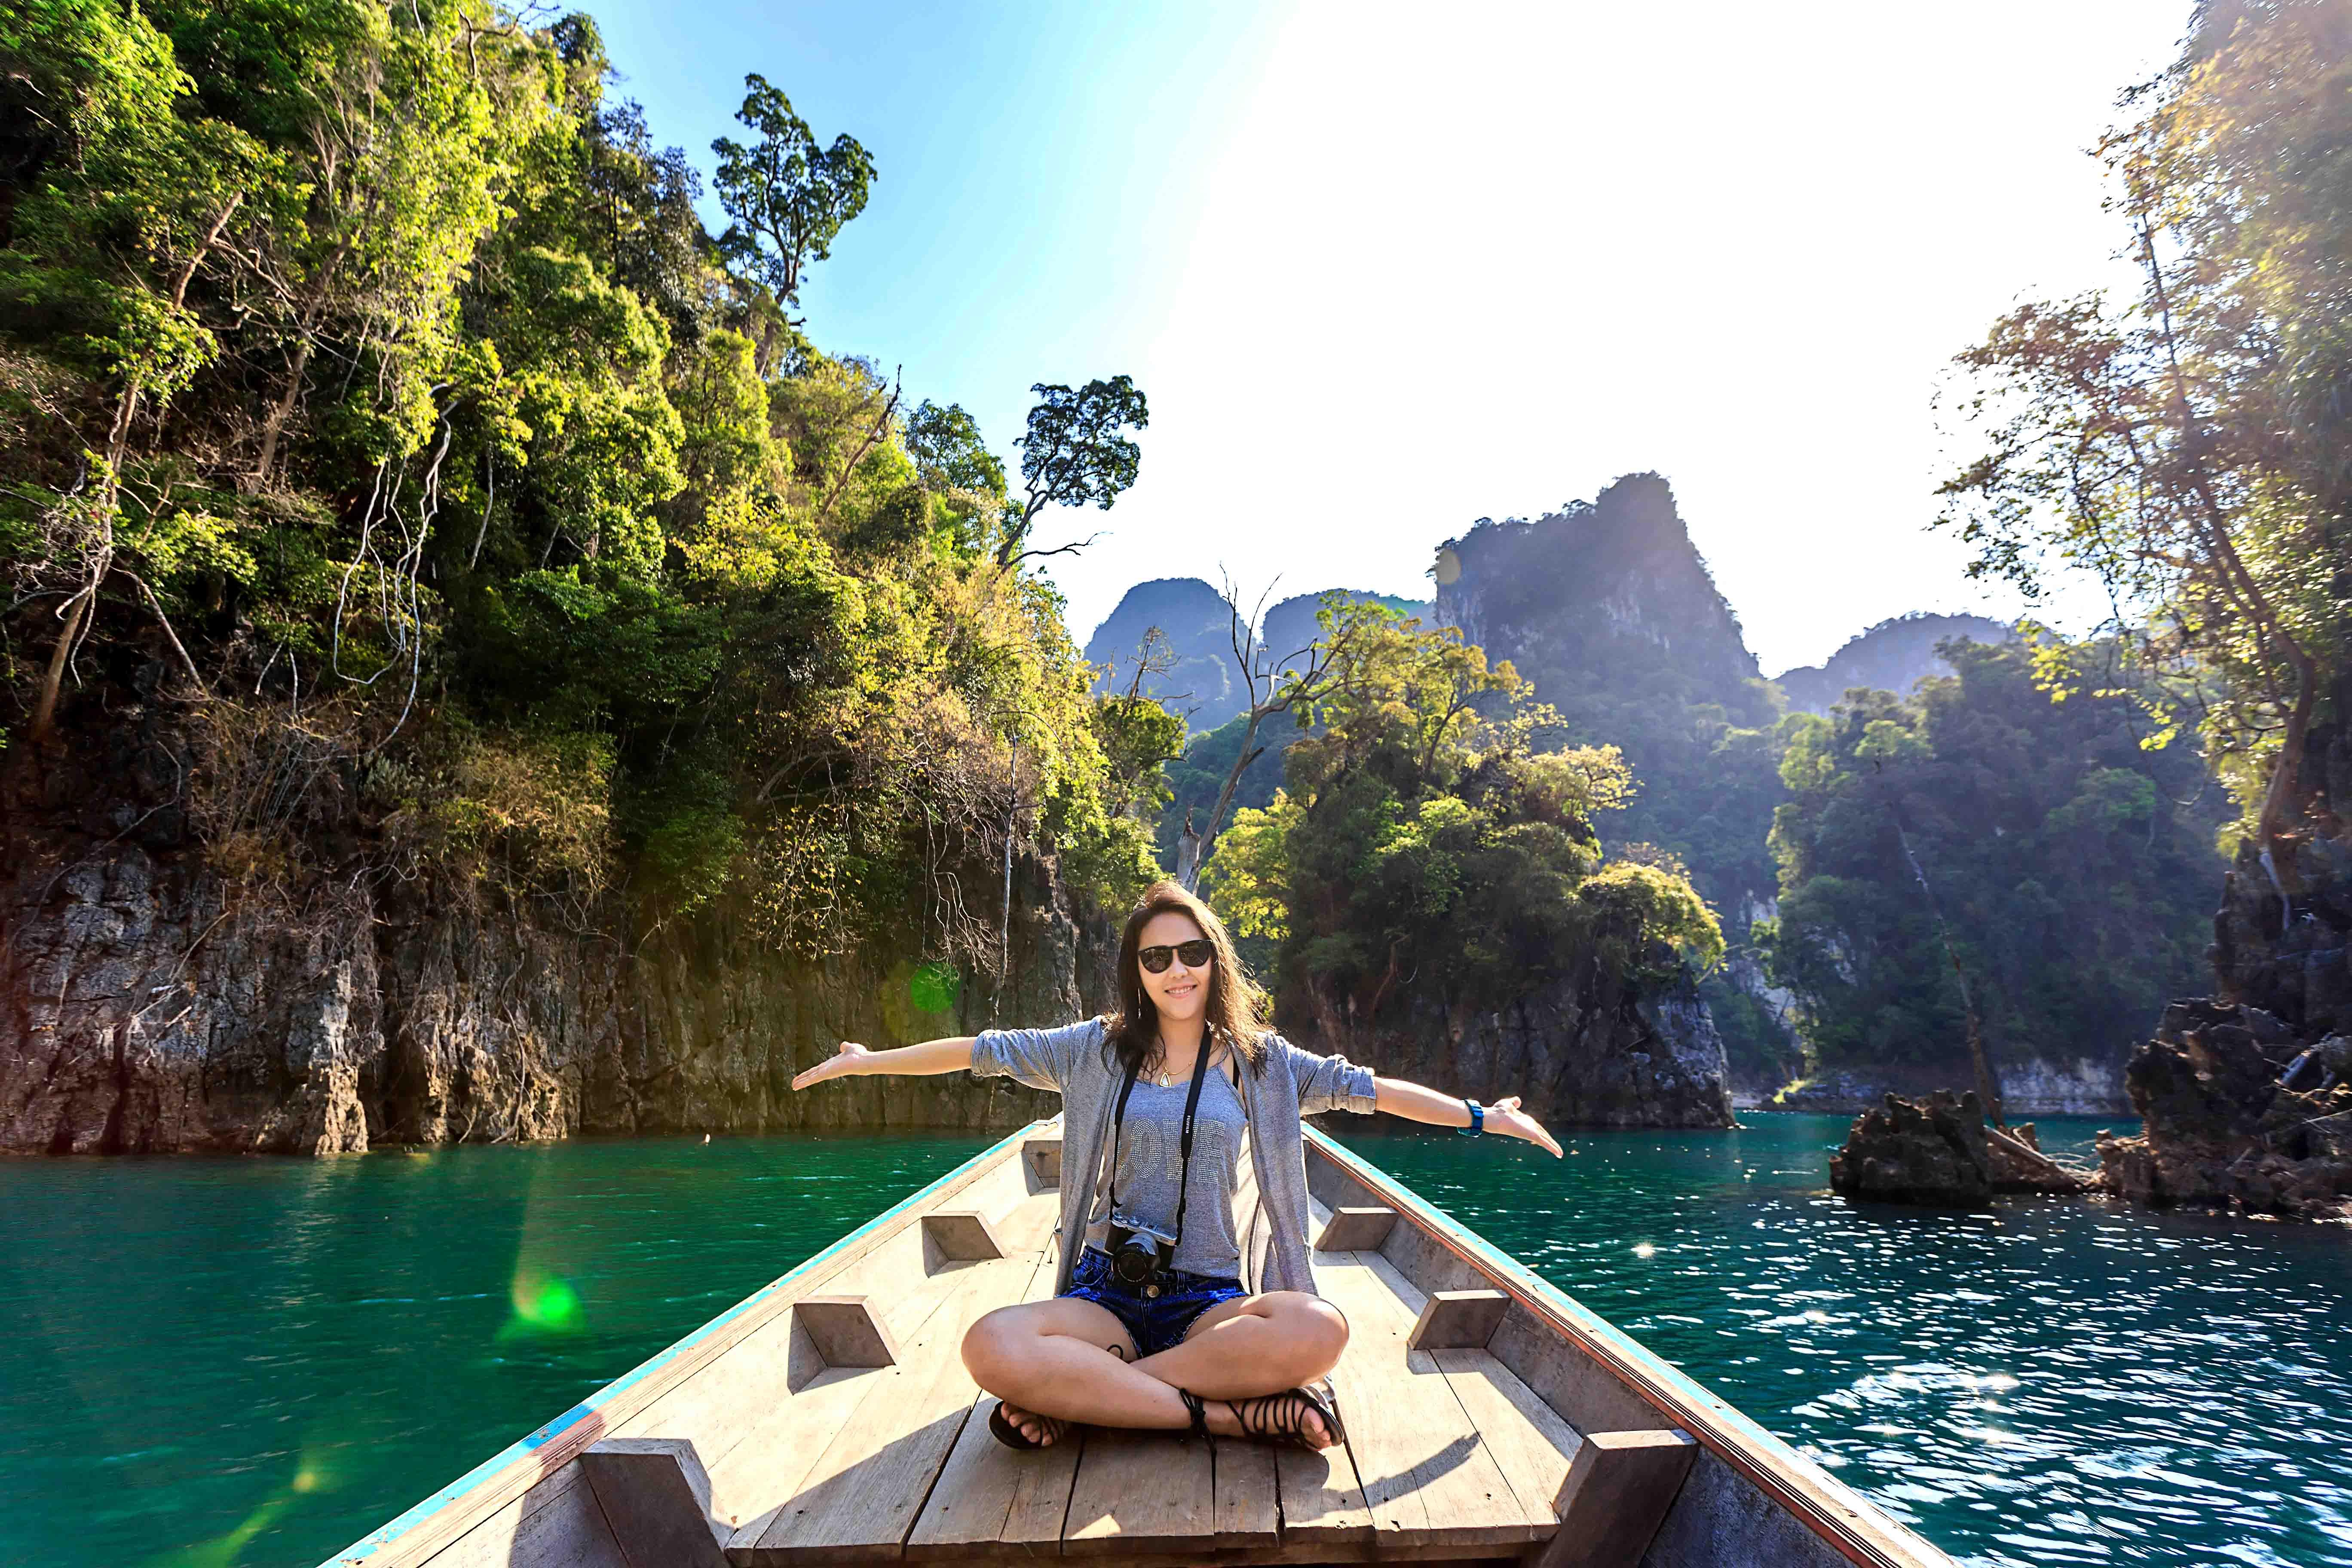 boat-exotic-freedom-1371360